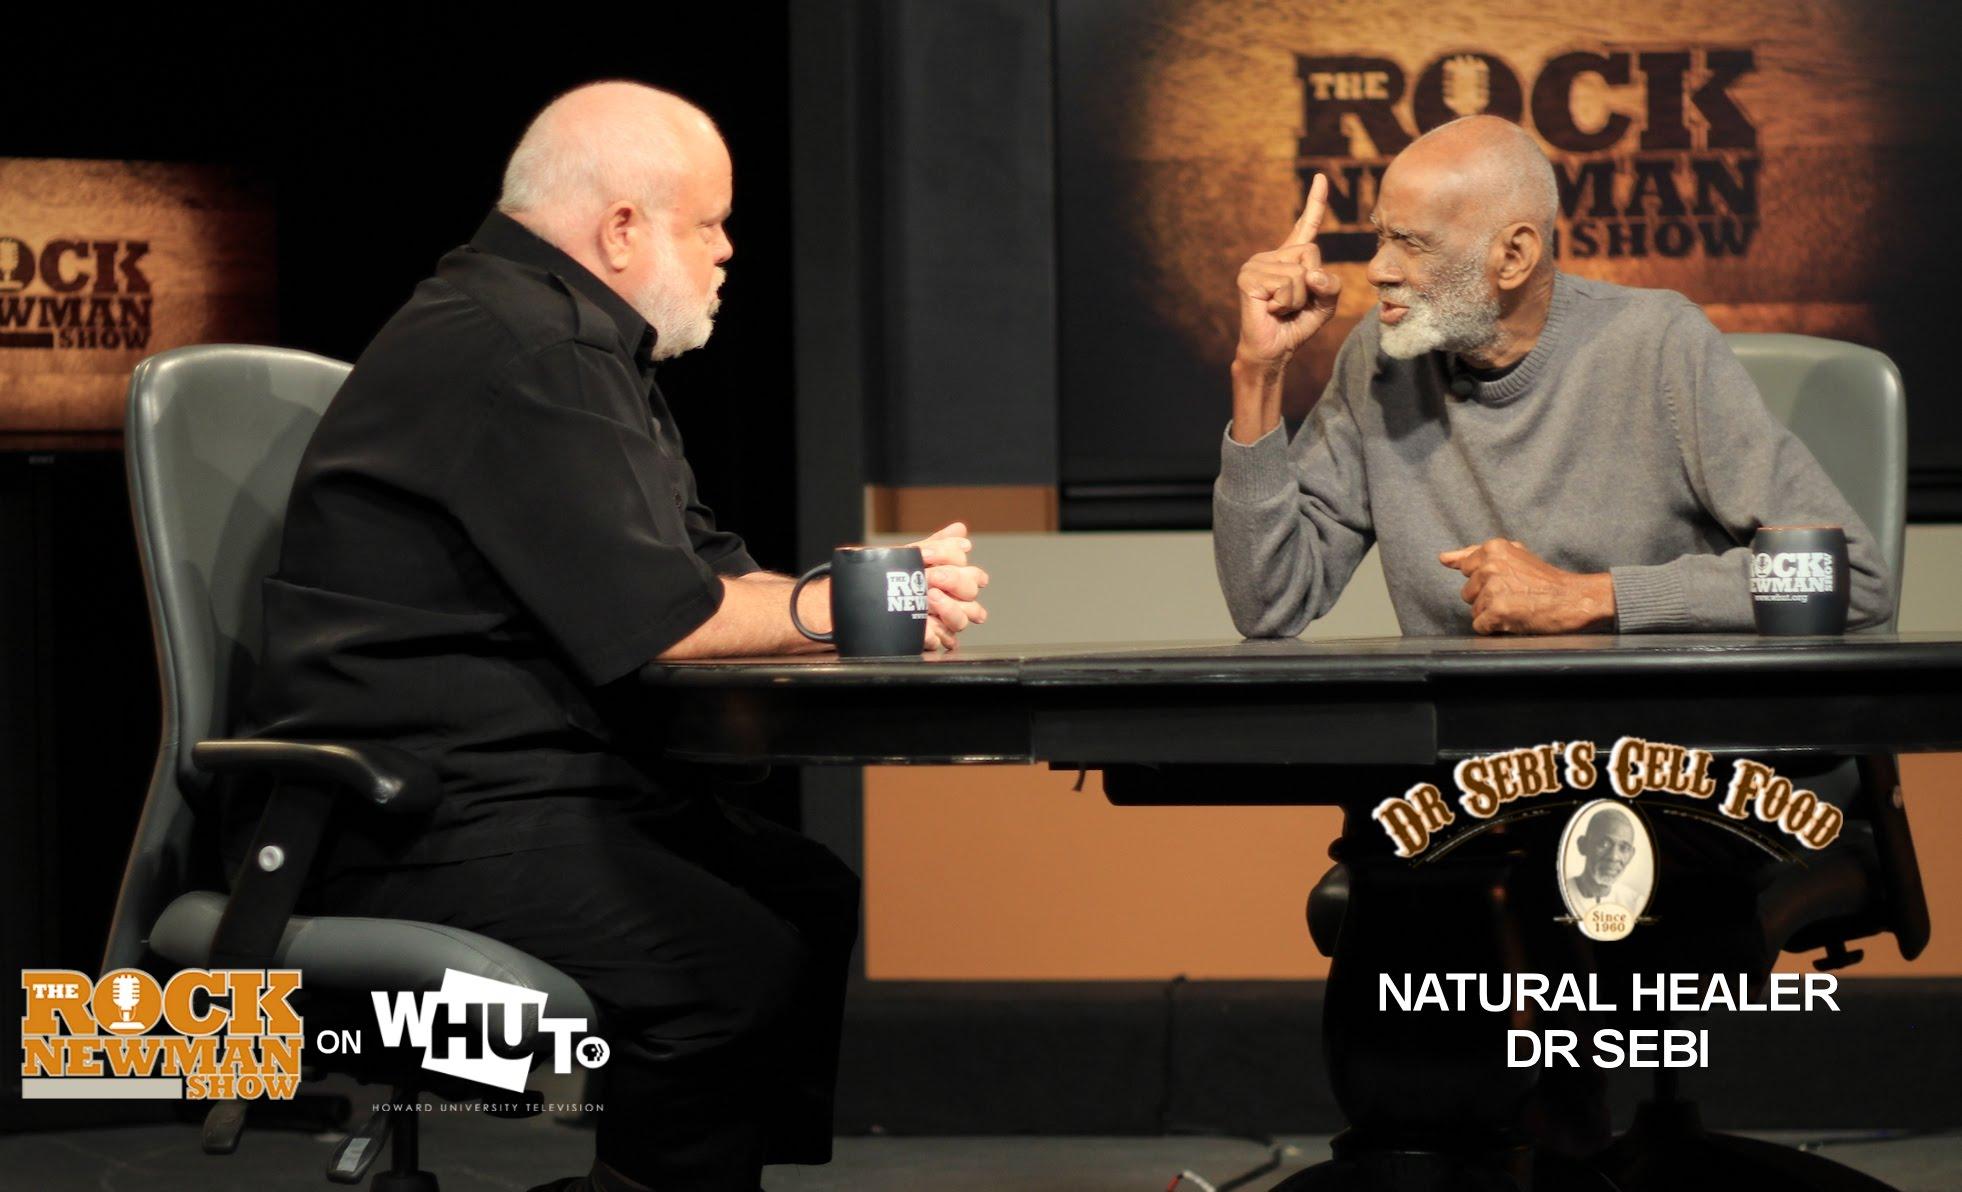 UITV: Dr. Sebi Discusses Supreme Court Win, Michael Jackson, Left Eye, & His Mission